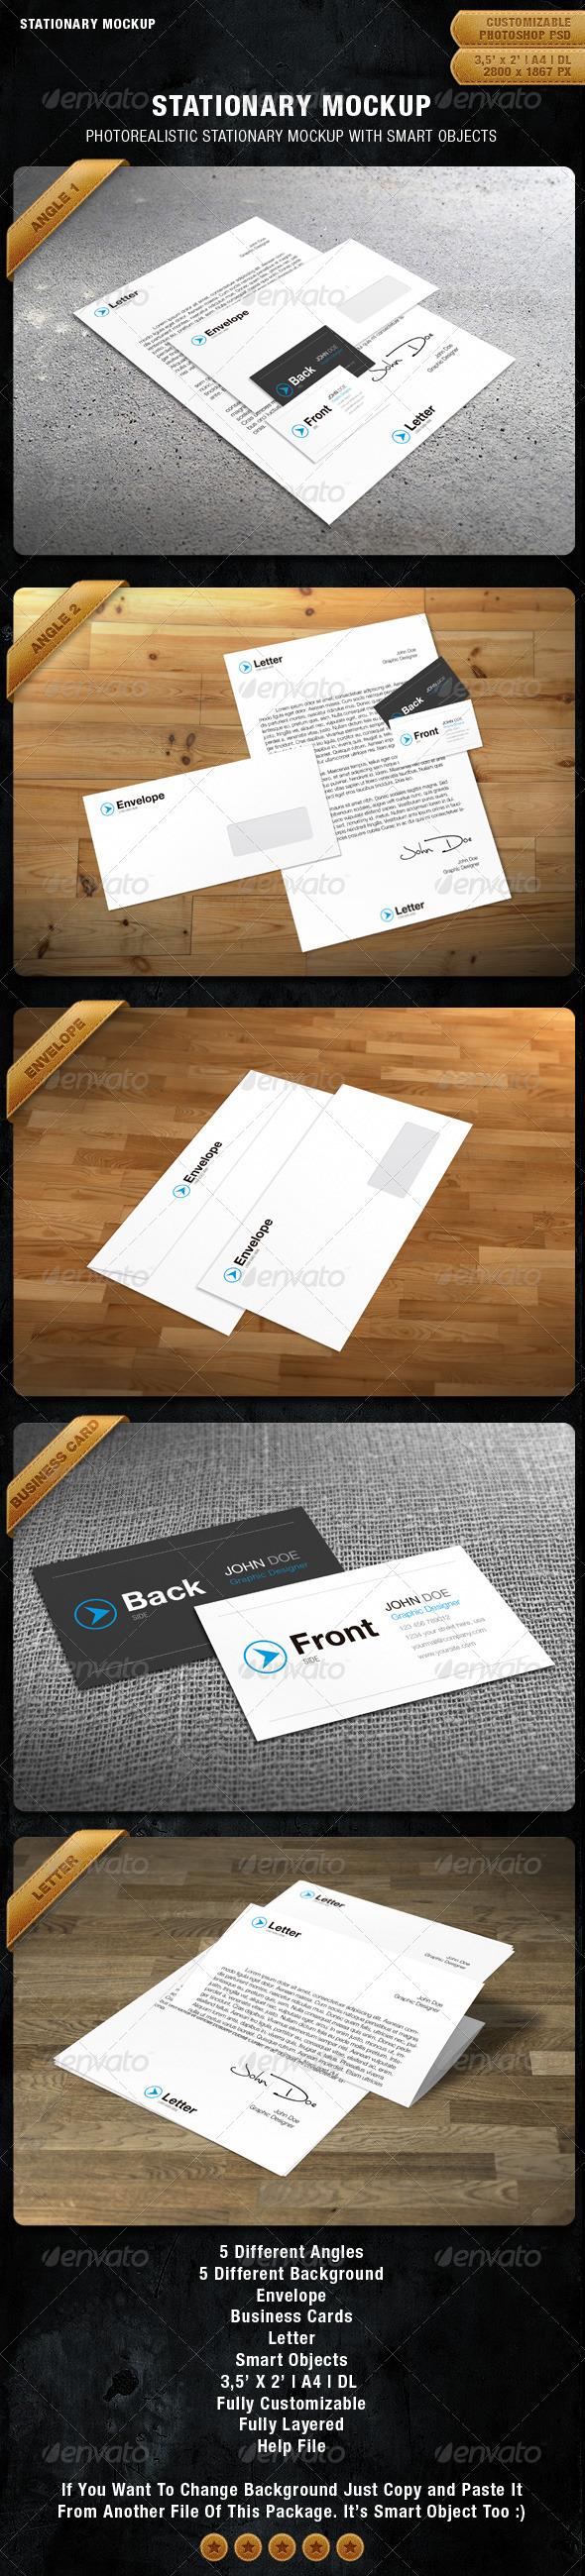 GraphicRiver Stationary Mockup 1201054